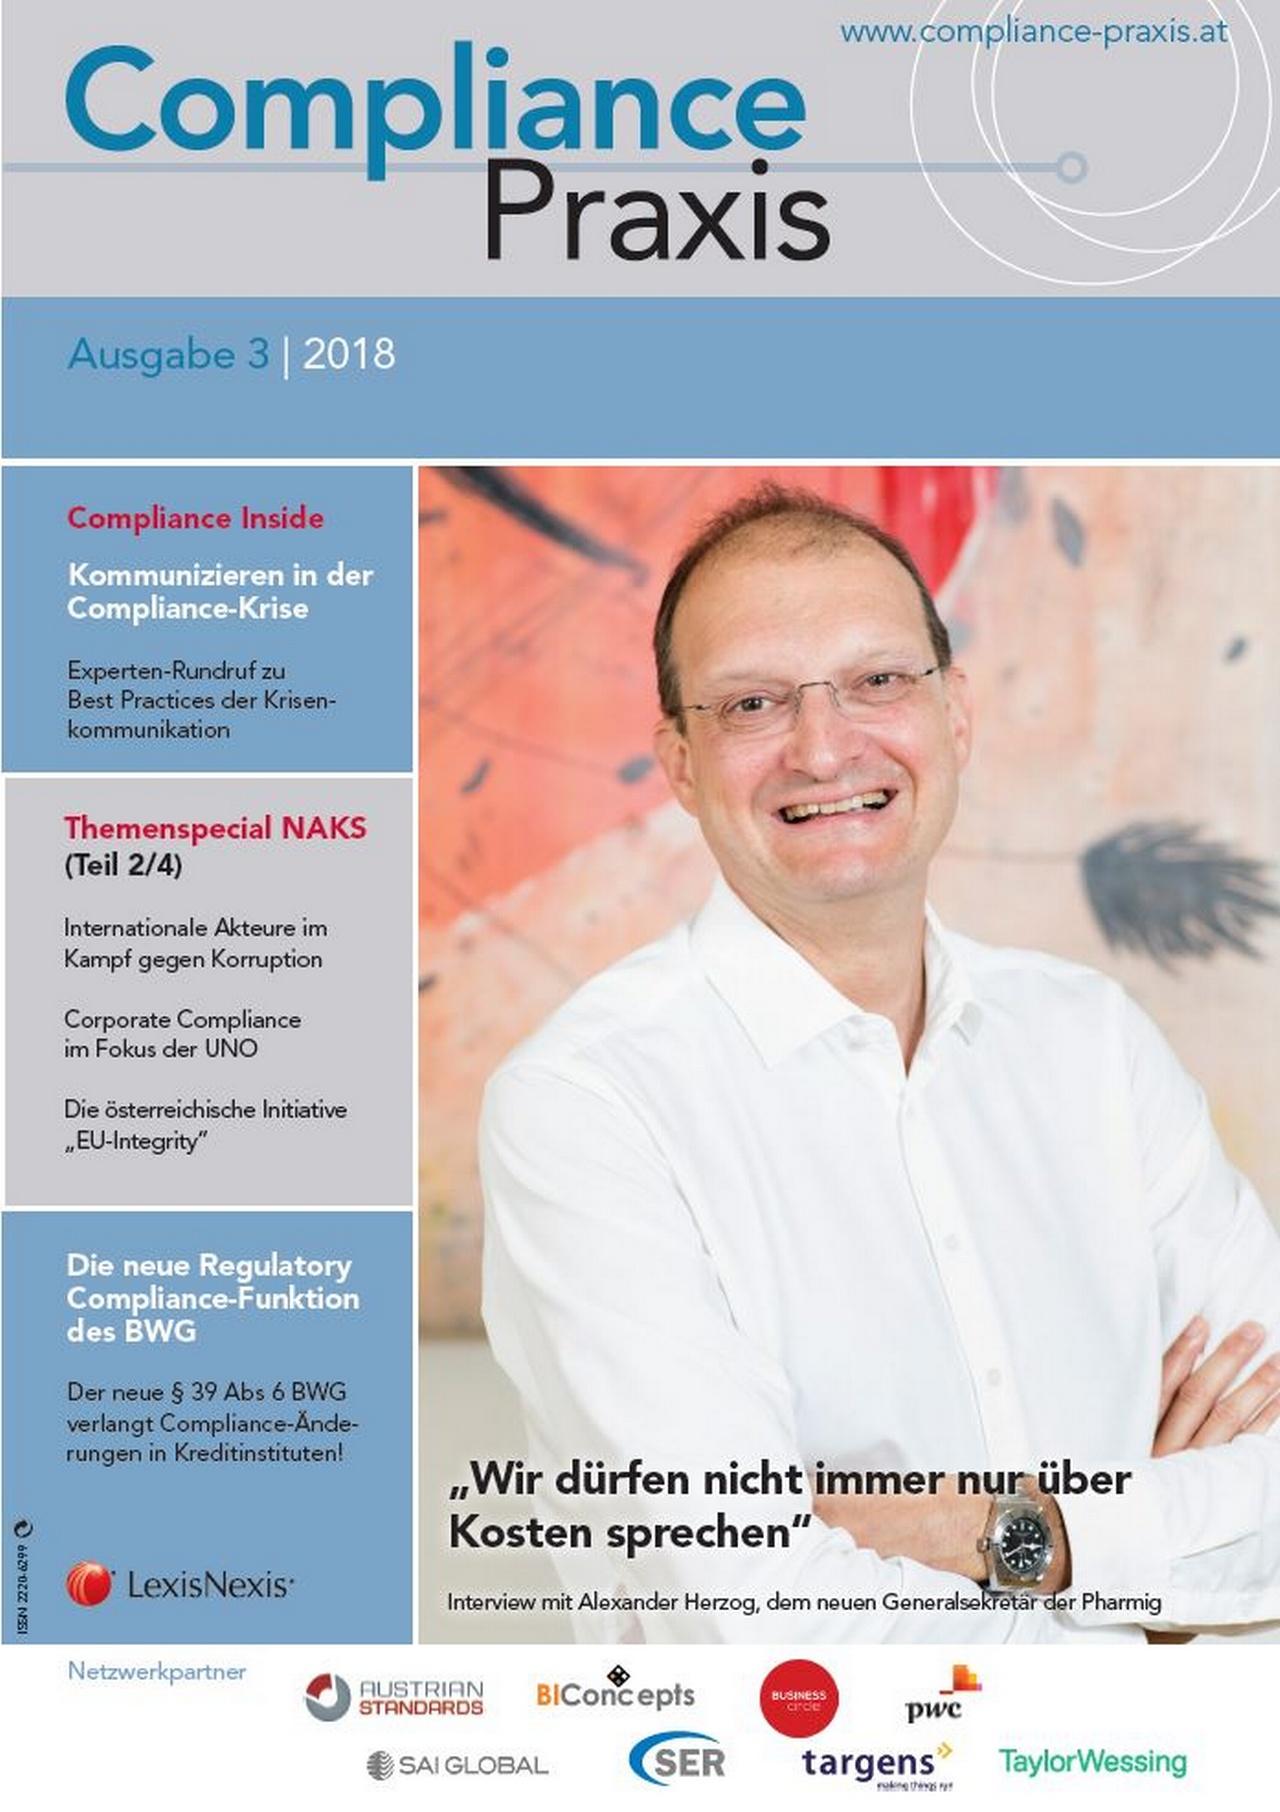 Cover von Compliance Praxis Ausgabe 3/2018, © LexisNexis